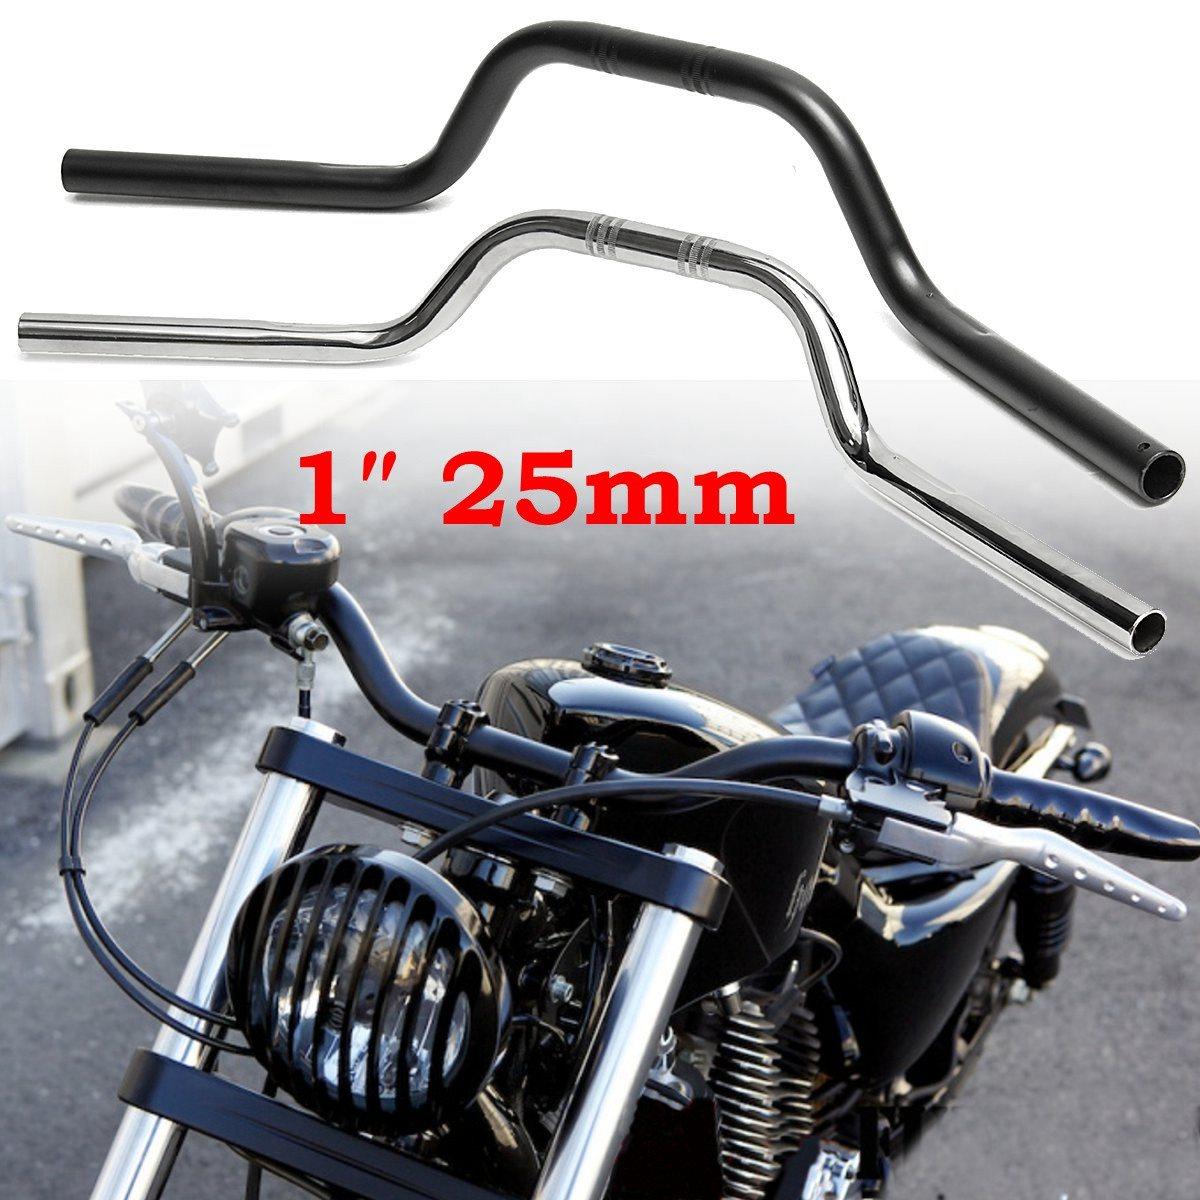 1 25mm Motorcycle Handlebar Drag Bars For Harley-Davidson 883 1200 motorcycle handlebars